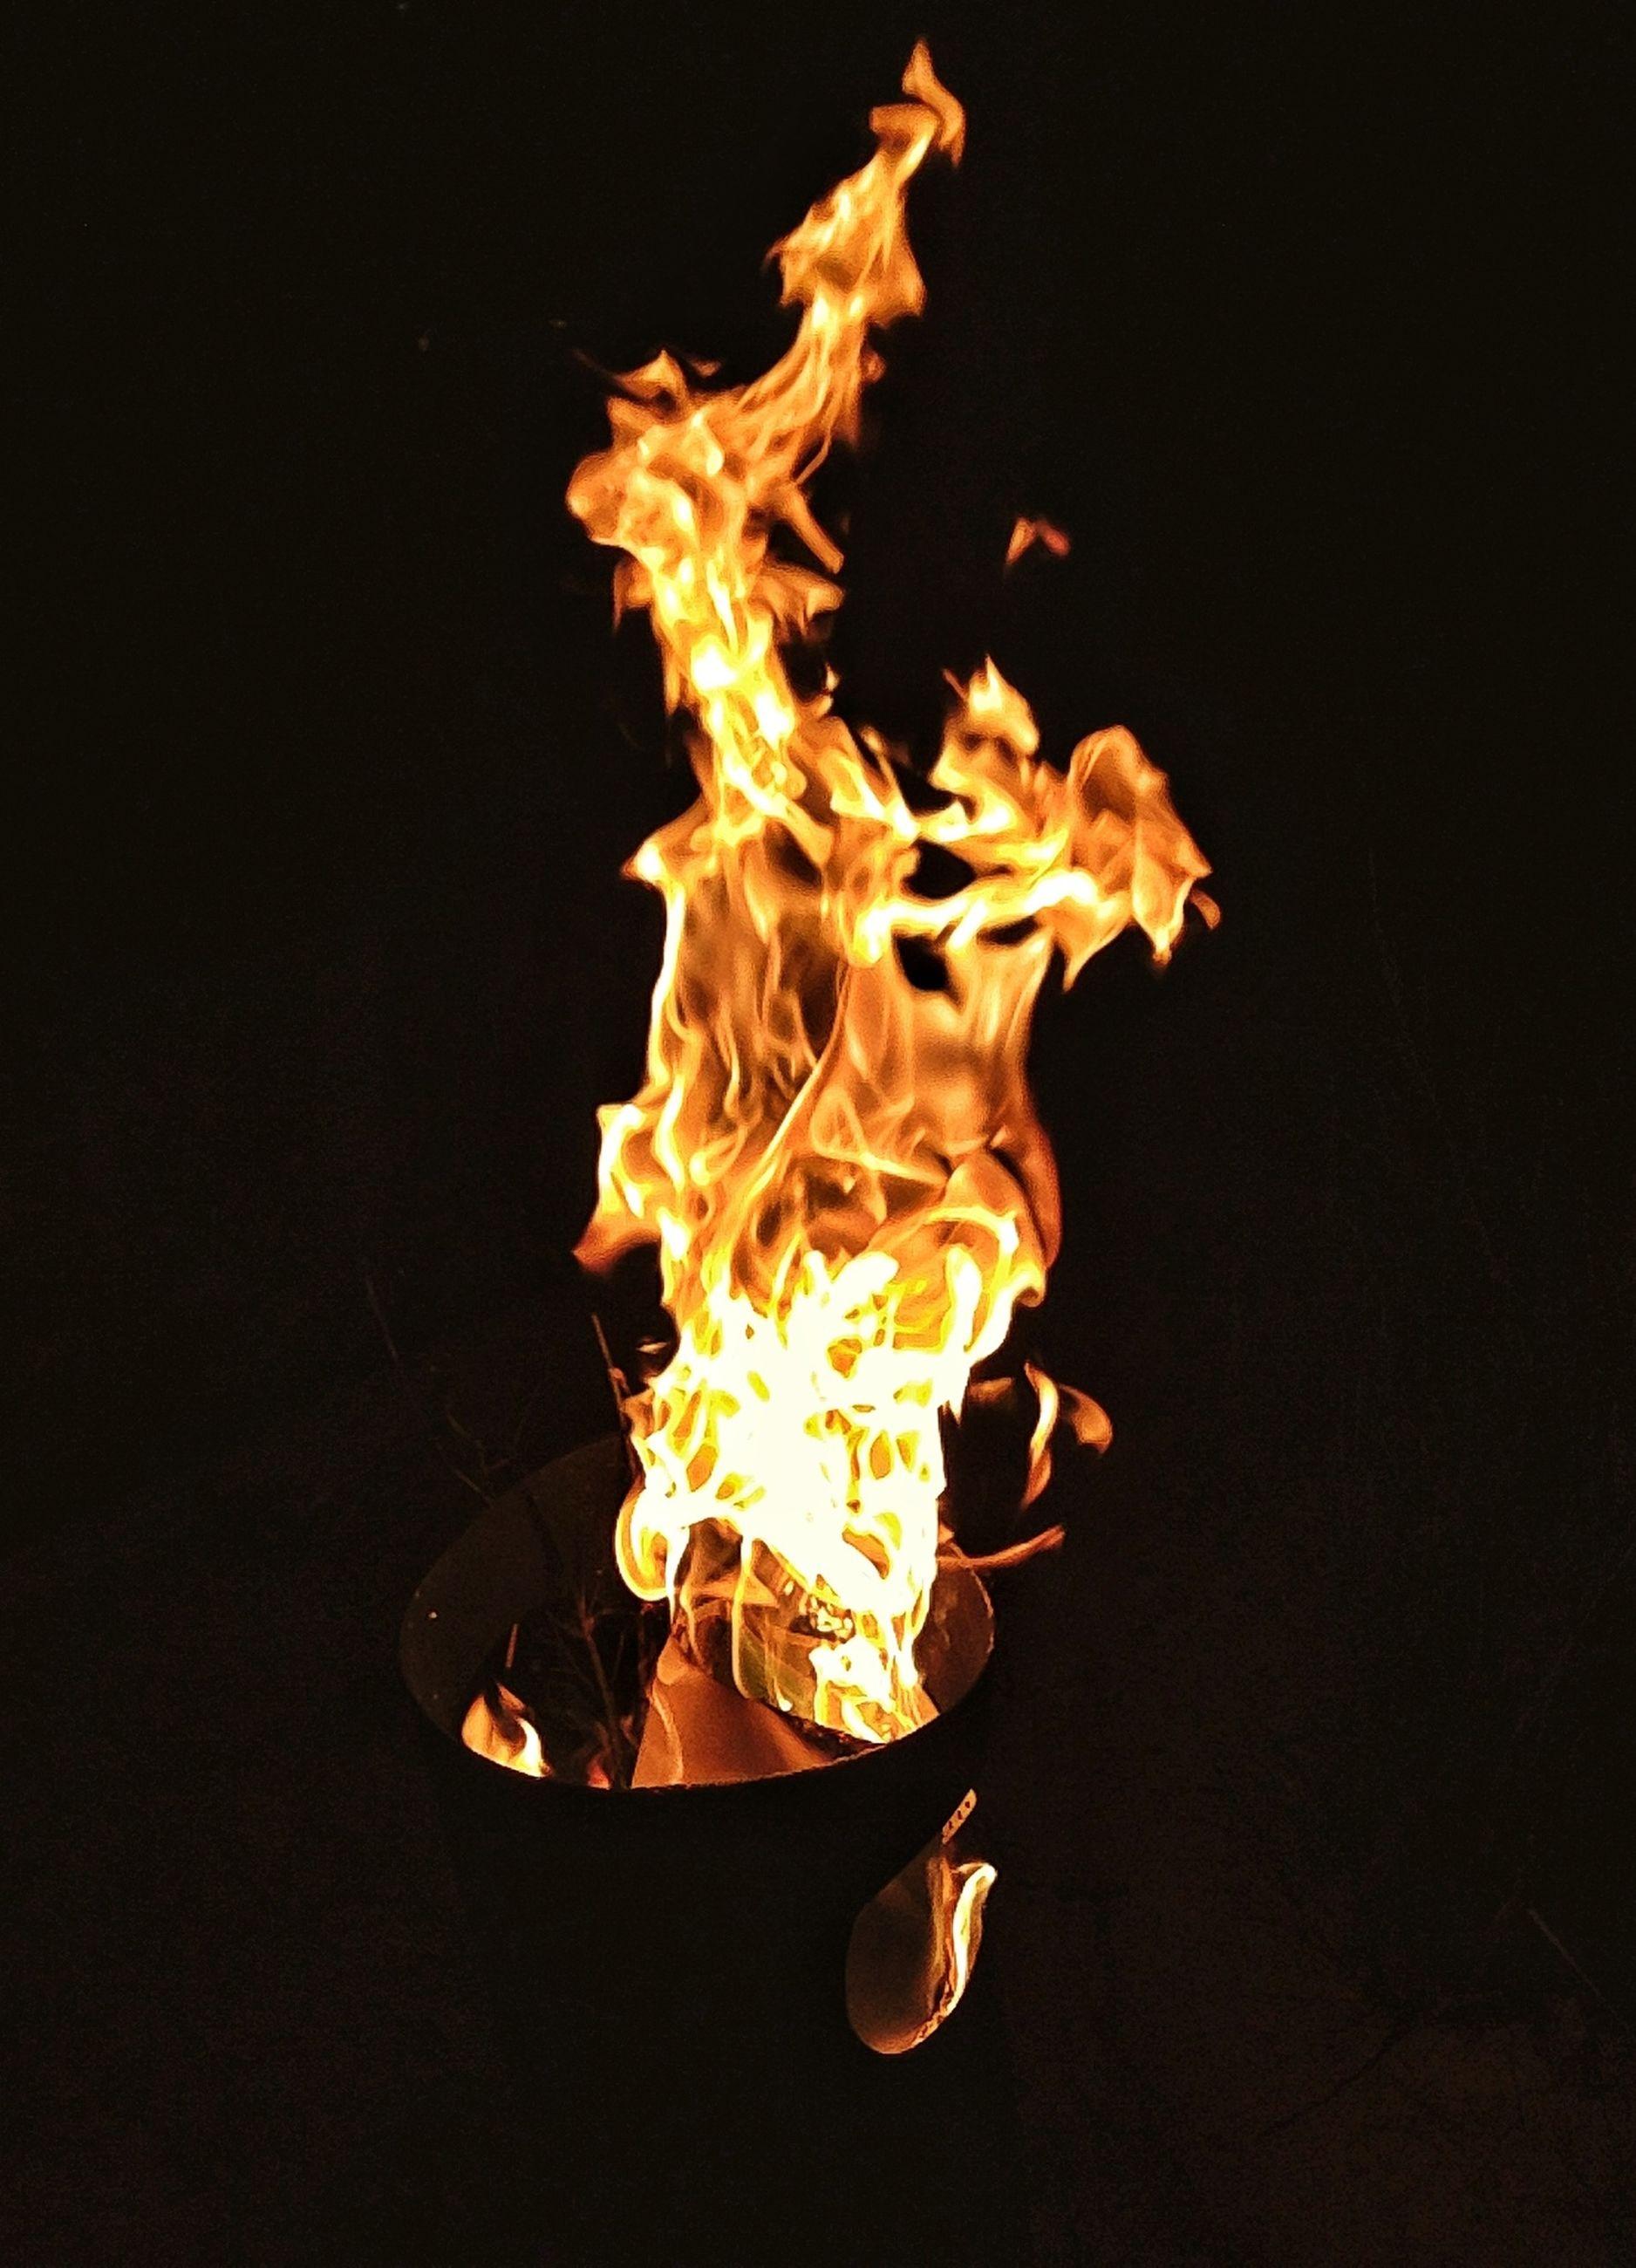 burning, flame, fire - natural phenomenon, heat - temperature, glowing, night, studio shot, black background, copy space, fire, illuminated, dark, close-up, bonfire, motion, heat, campfire, lit, orange color, firewood